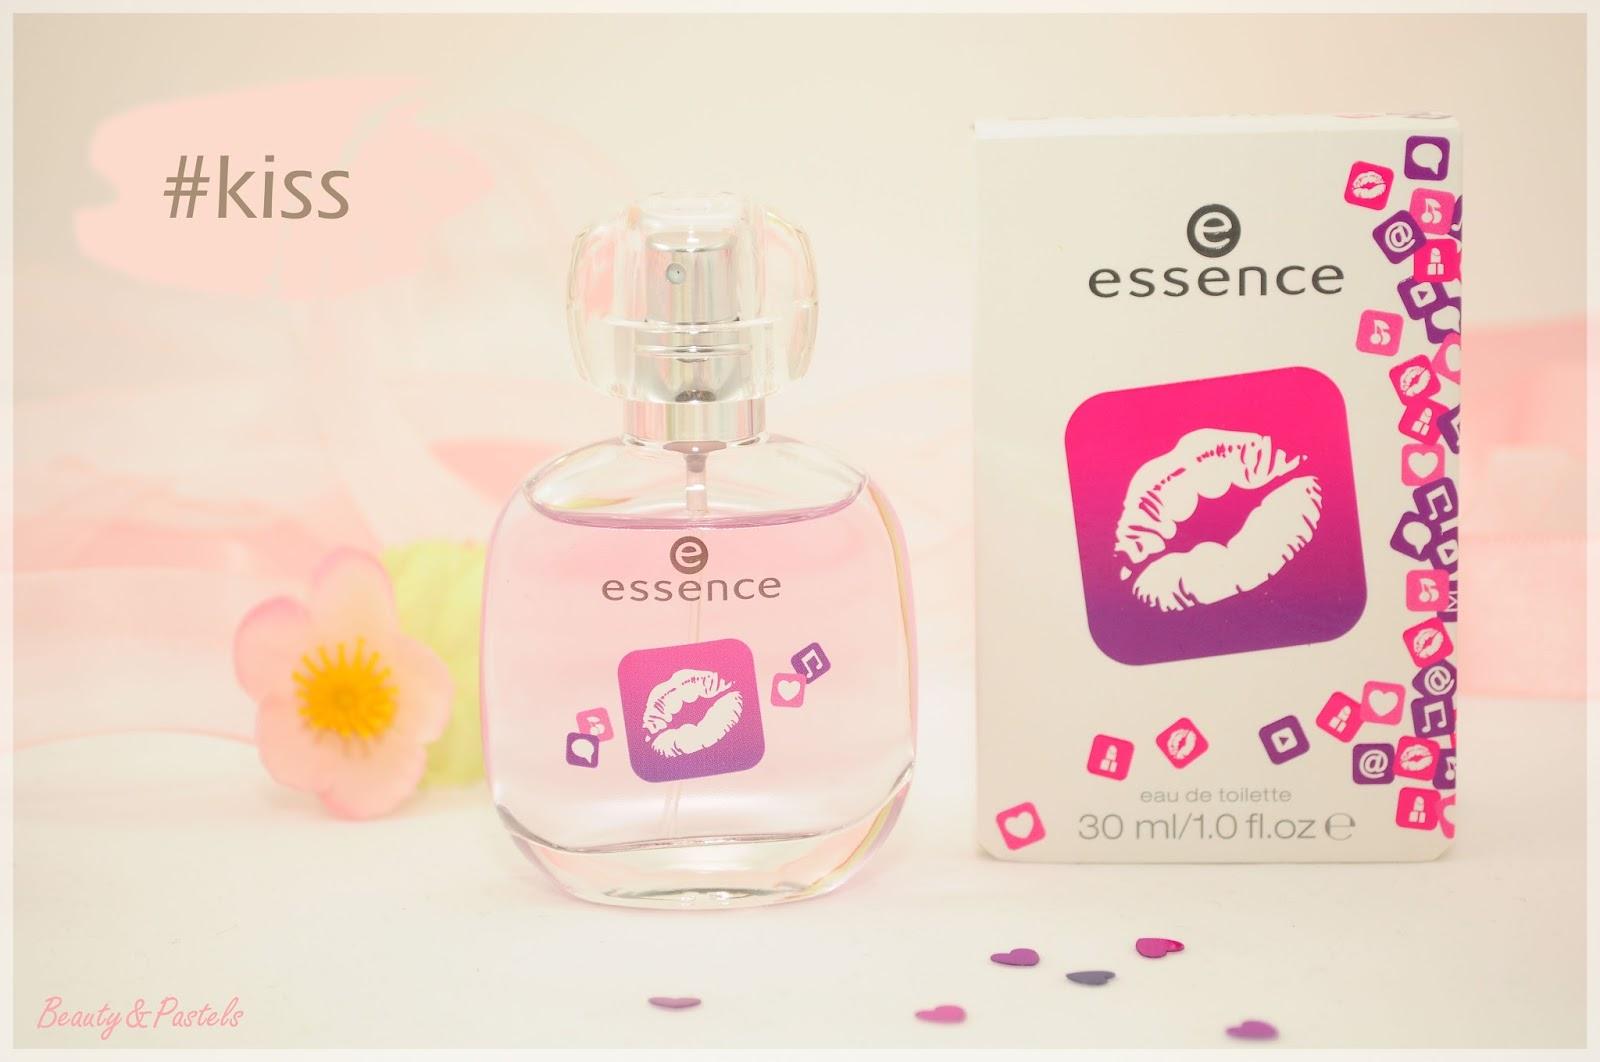 essence-Duft-kiss